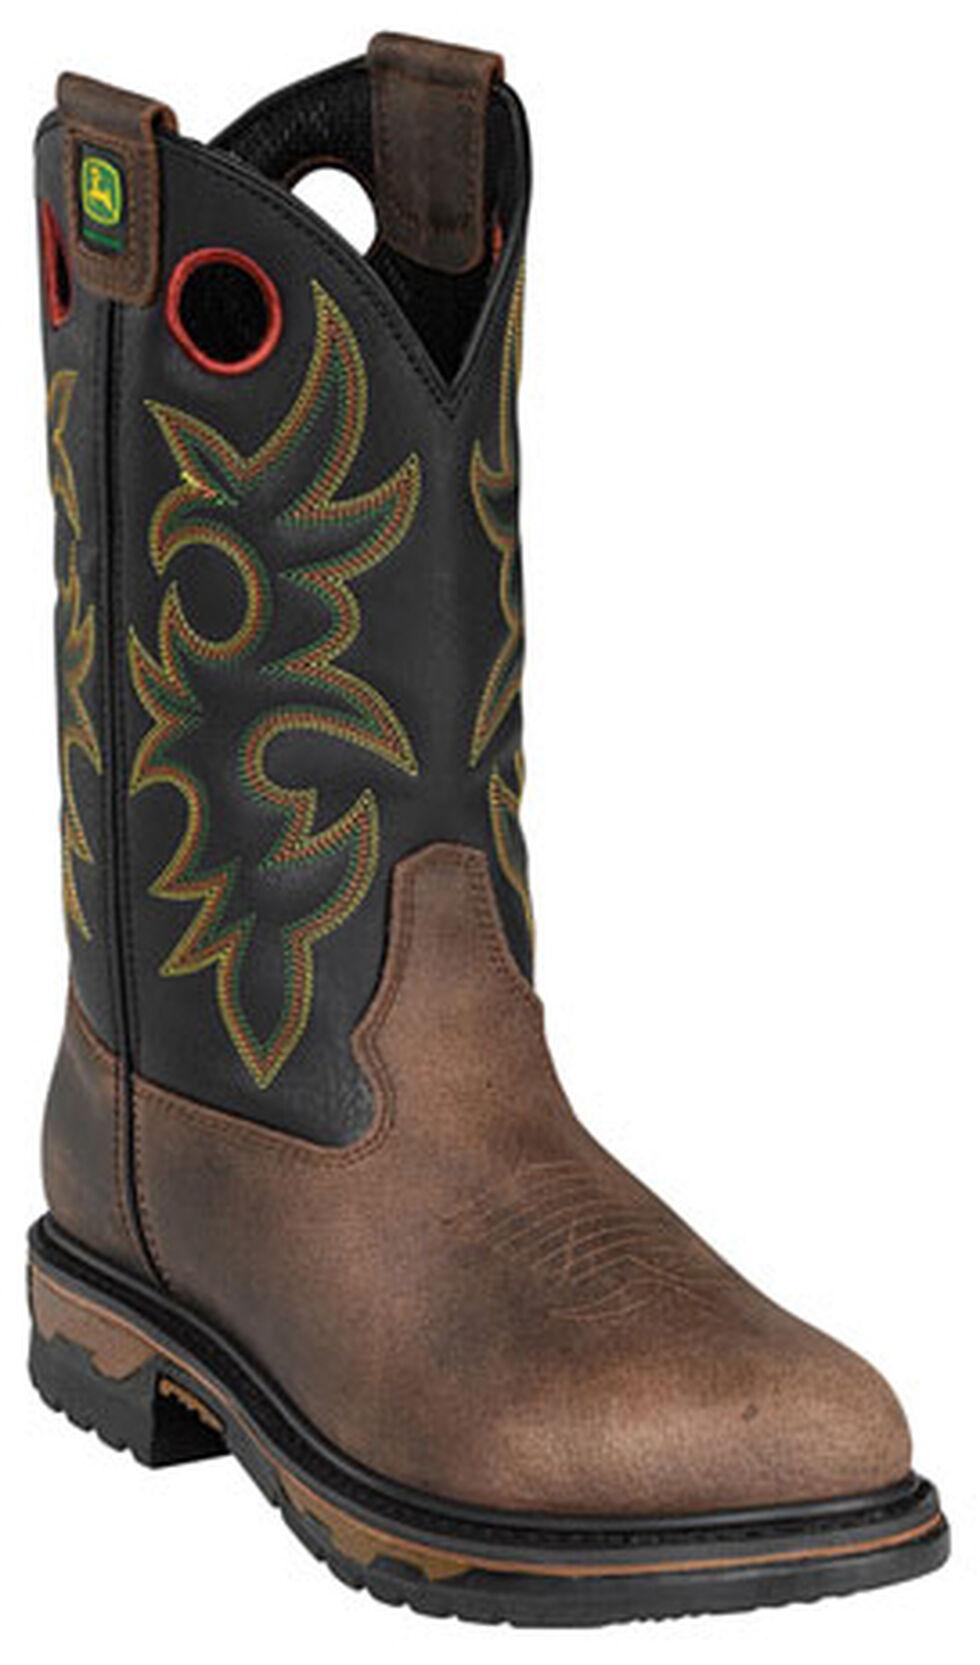 John Deere Men's Western Work Boots - Round Toe, Tan, hi-res